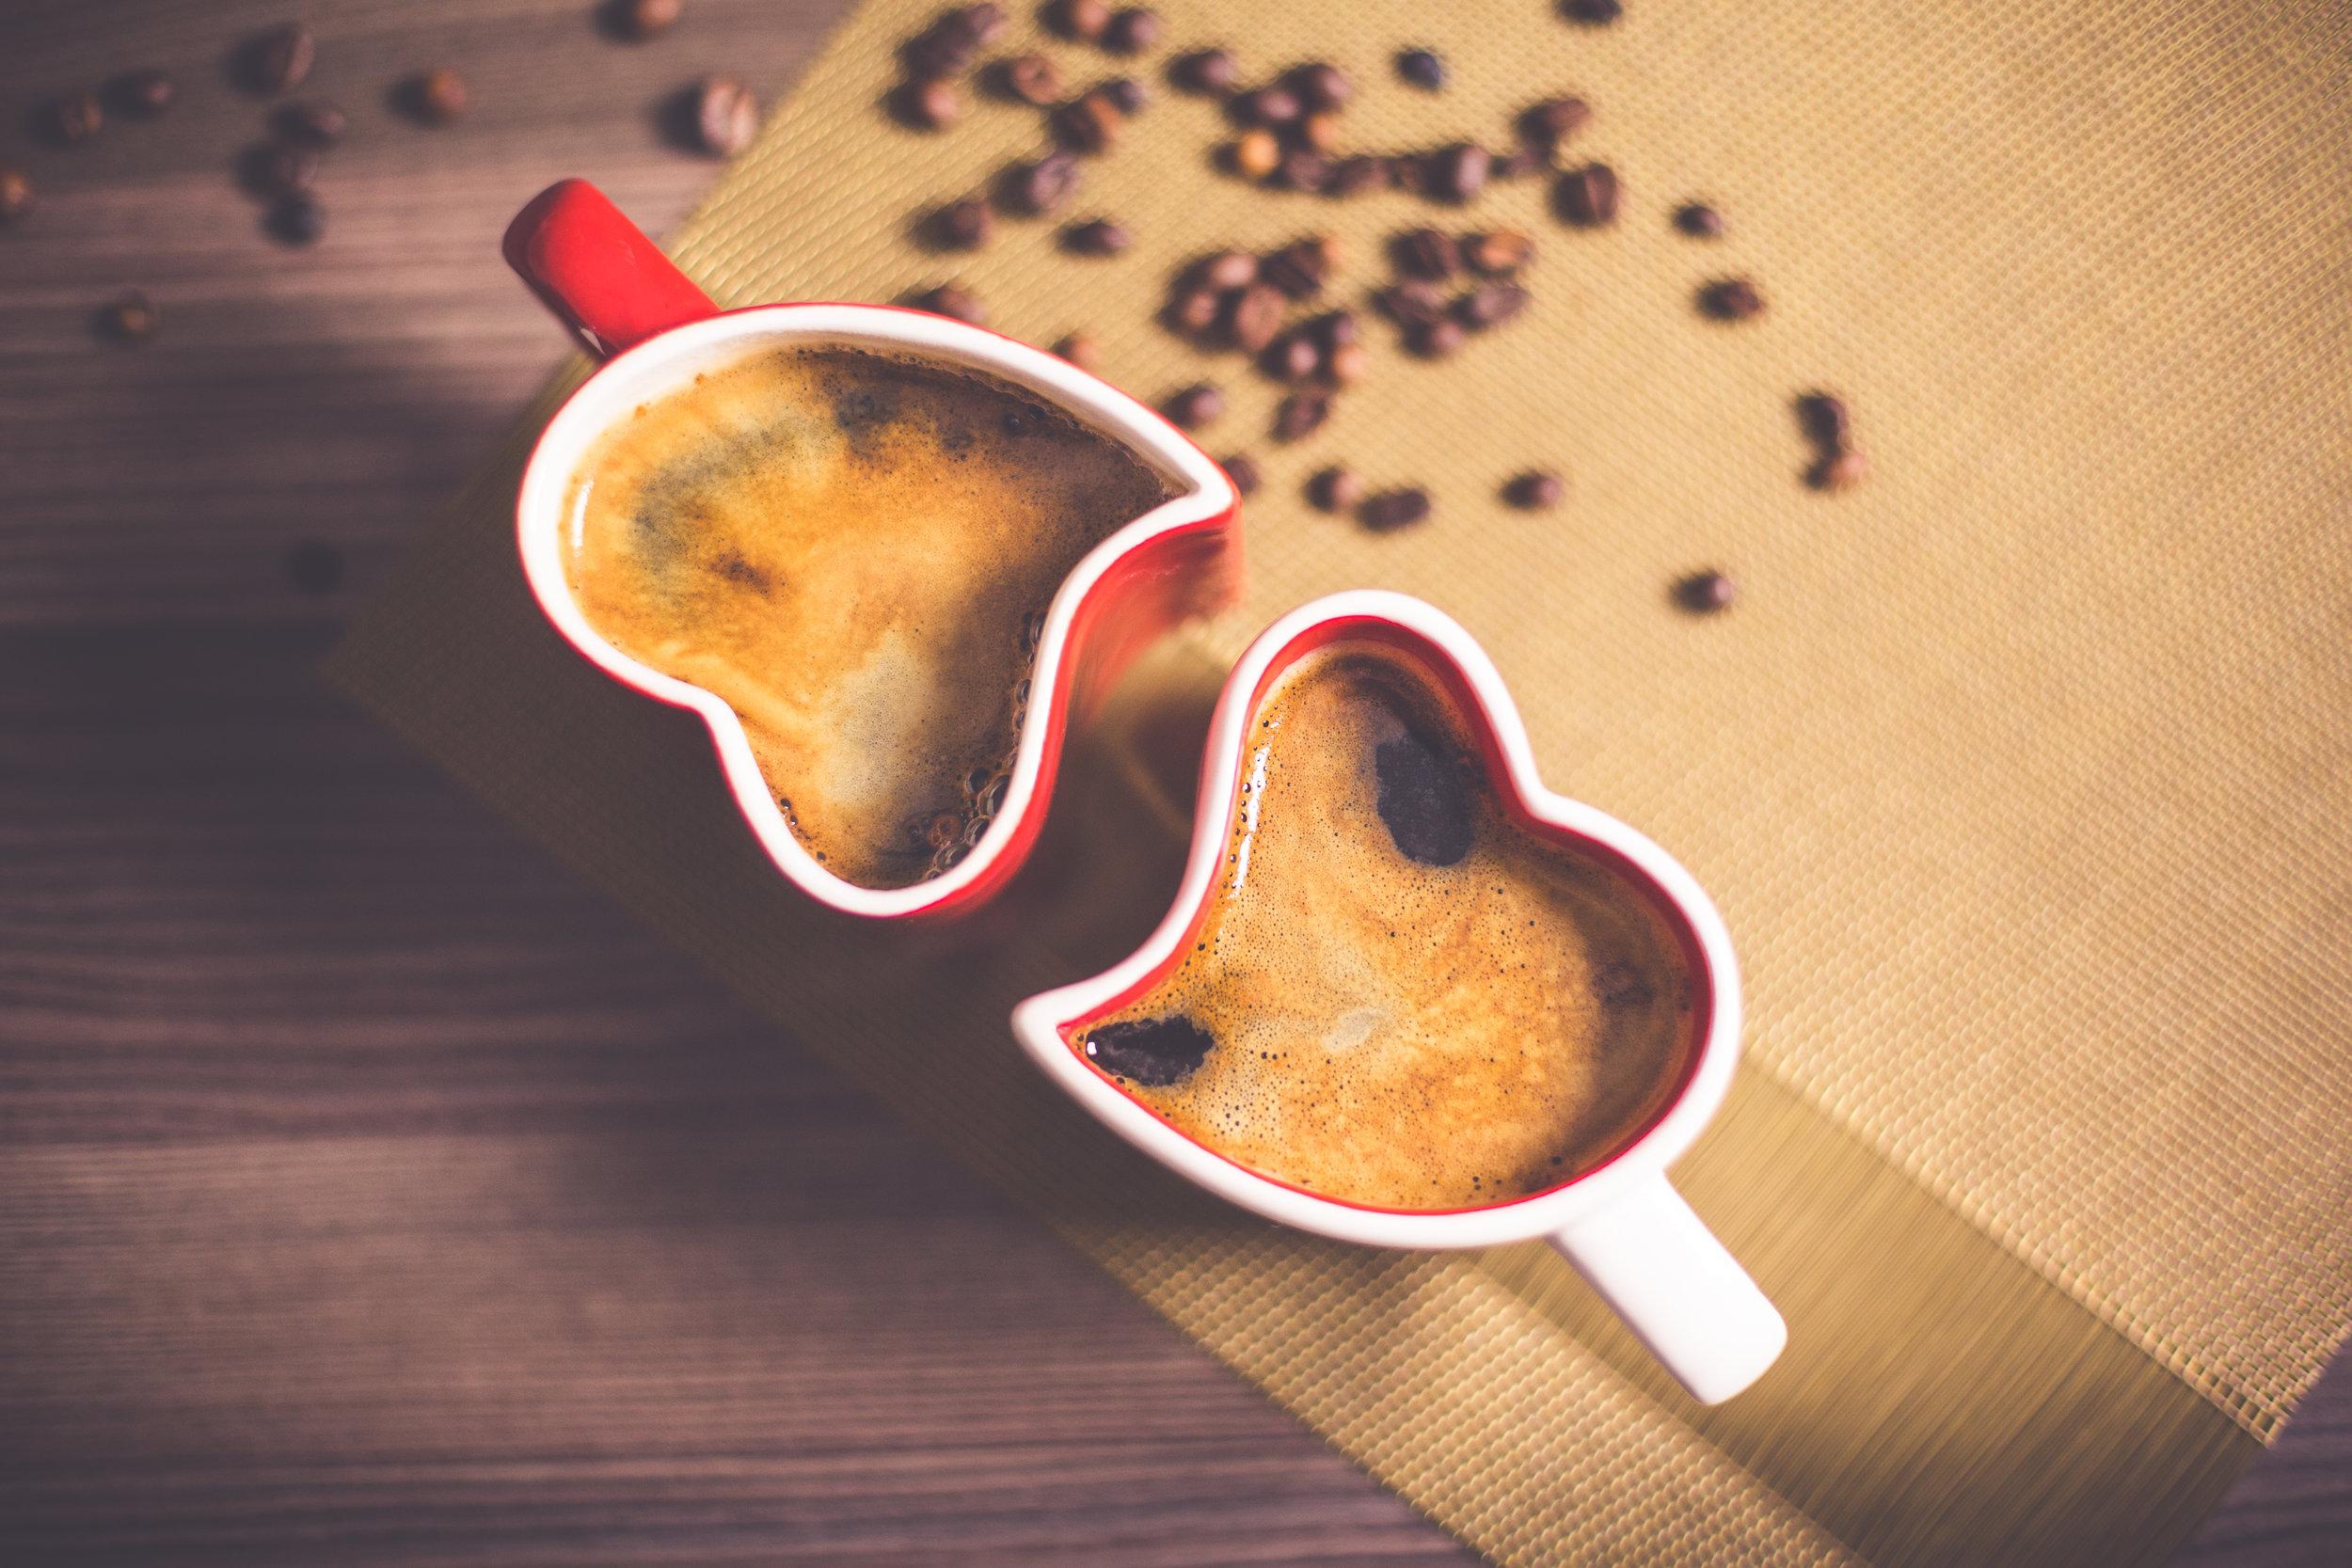 lovely-and-romantic-heart-coffee-cups-picjumbo-com.jpg